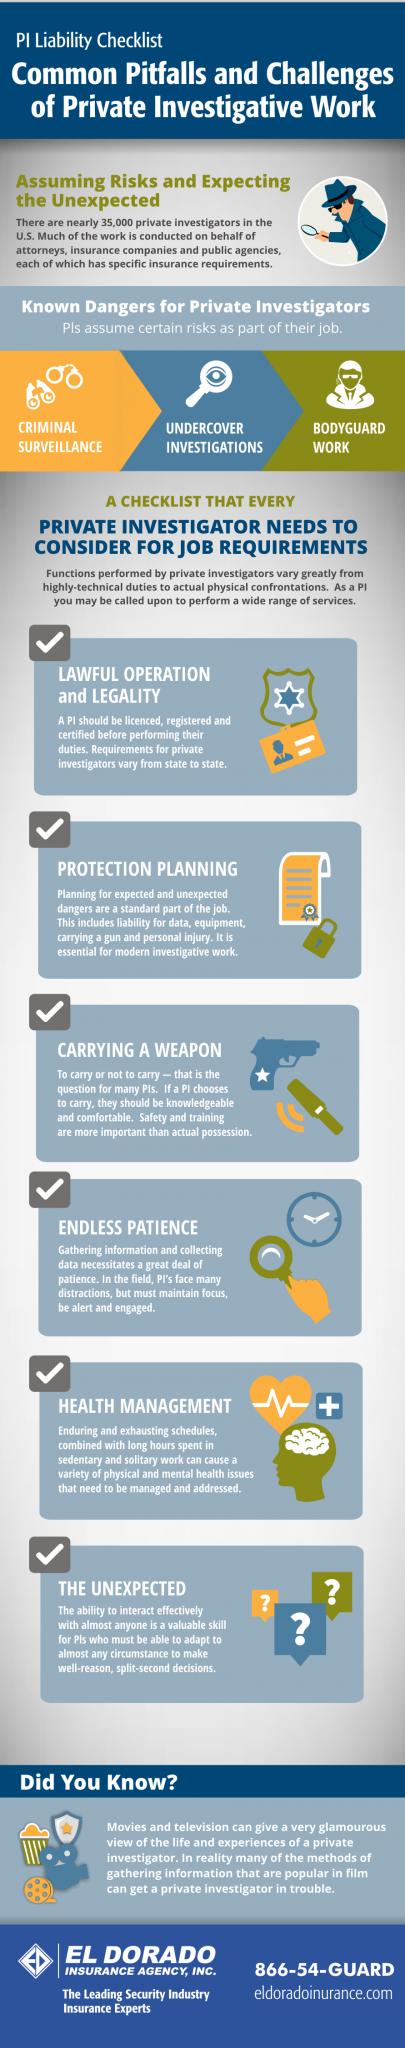 El_Dorado_Infographic_Liability_Checklist_new